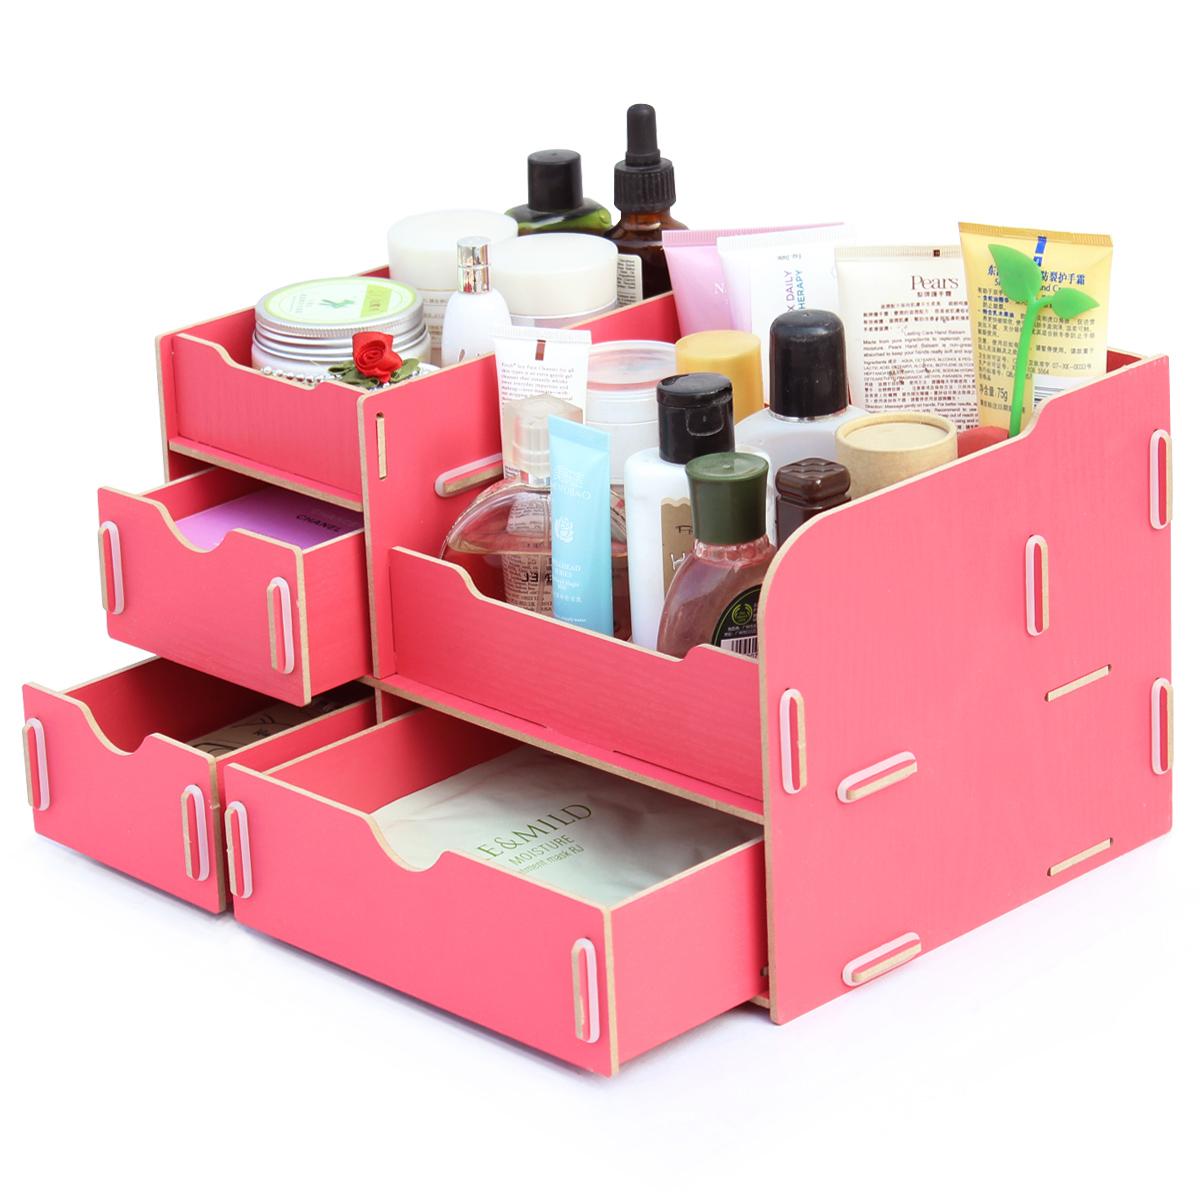 50% Off DIY Makeup Organizer American Style Wooden Box Eco-friendly Cosmetic Organizer Storange Box With Drawer Shelf(China (Mainland))